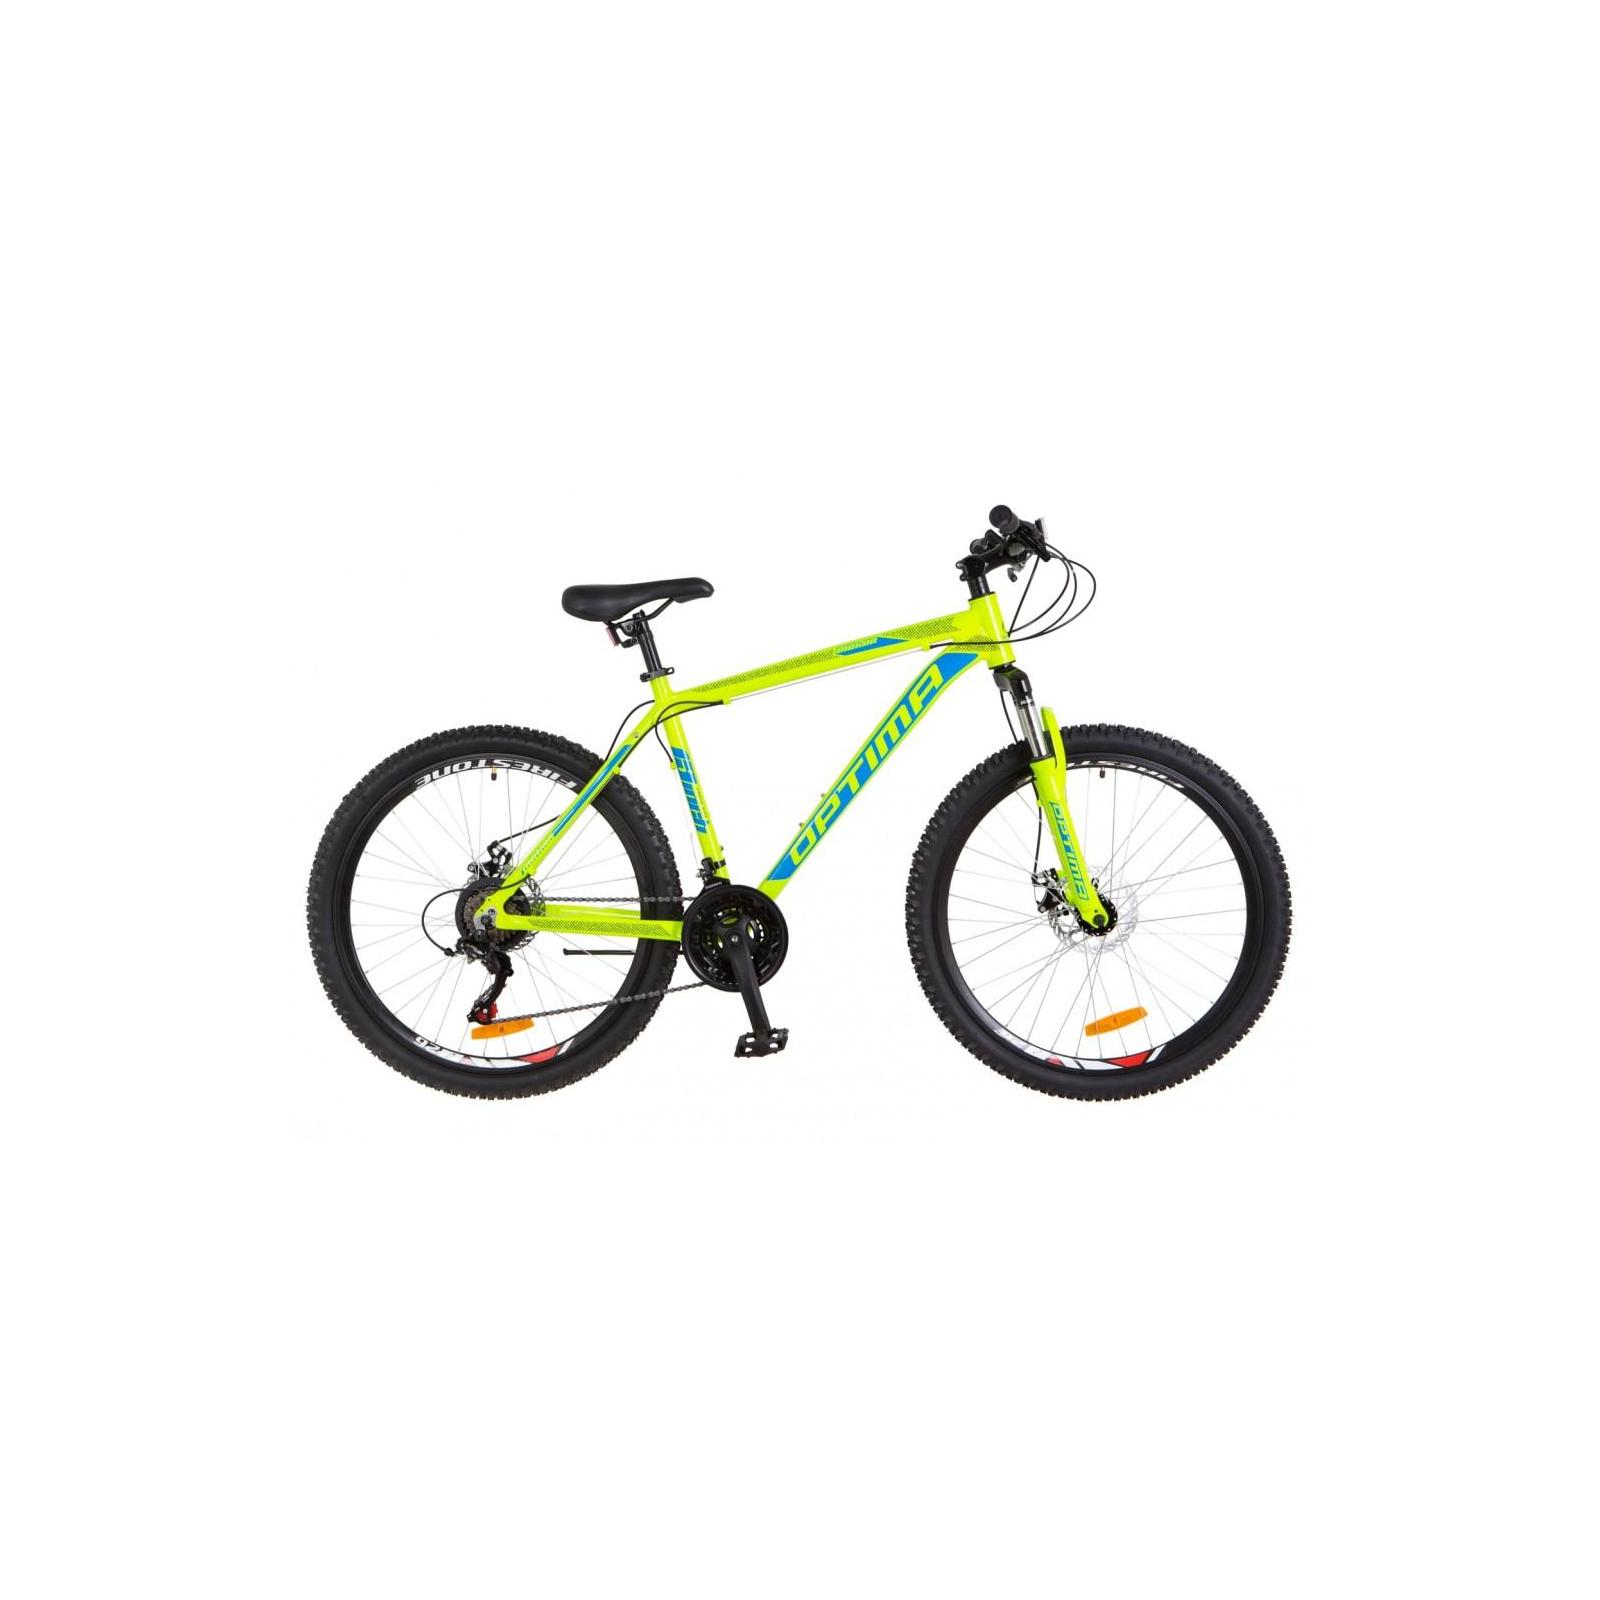 "Велосипед Optimabikes 26"" MOTION 2018 AM 14G DD рама-13"" Al салатово-синий (OPS-OP-26-113)"